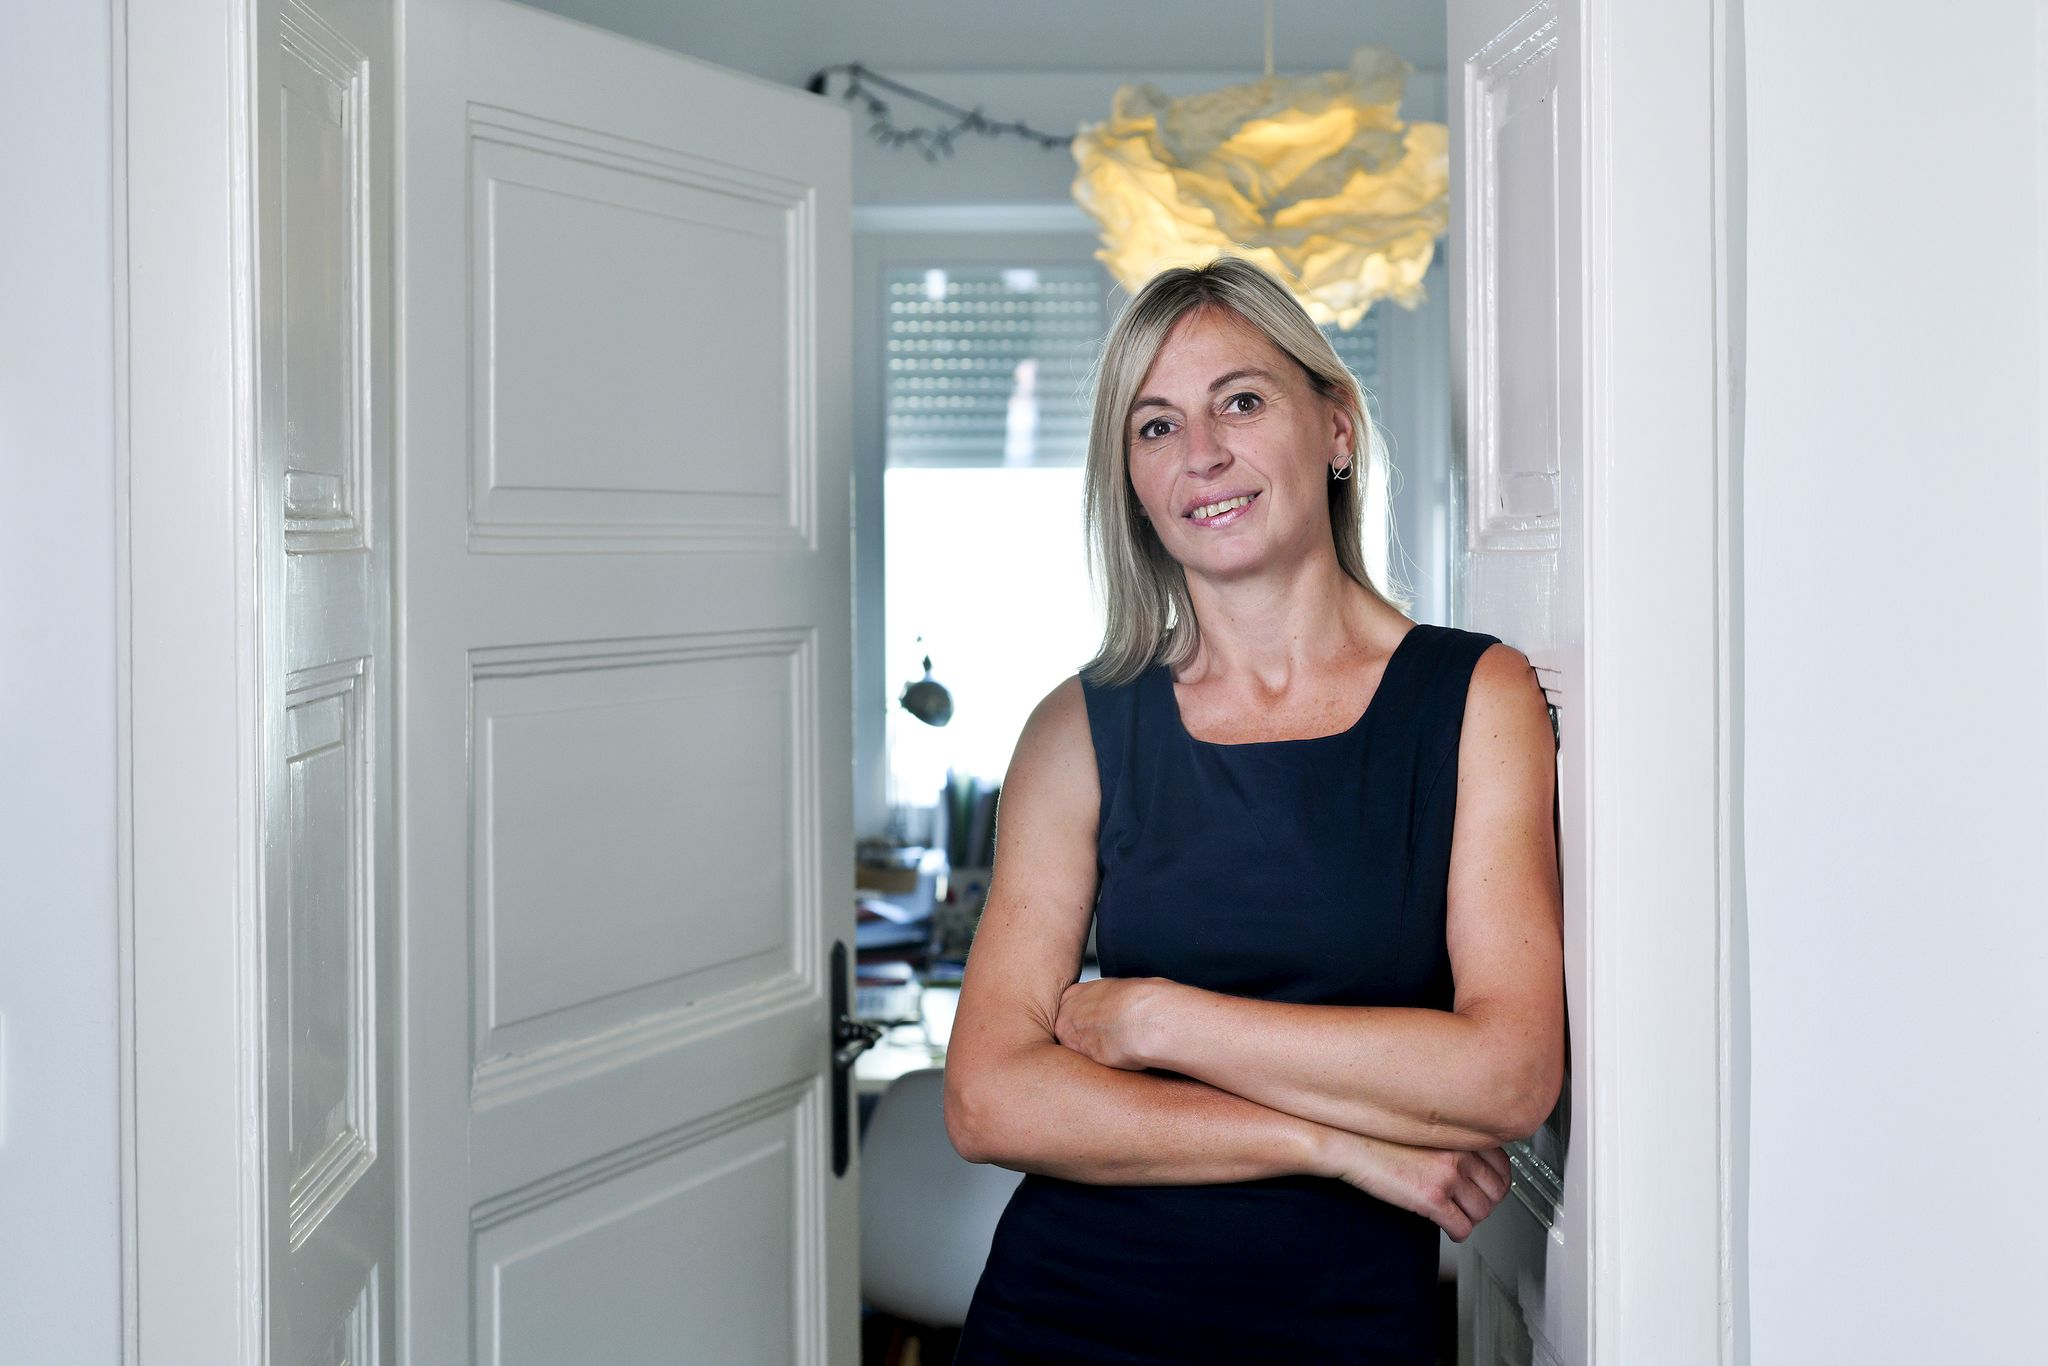 Mirna Karzen